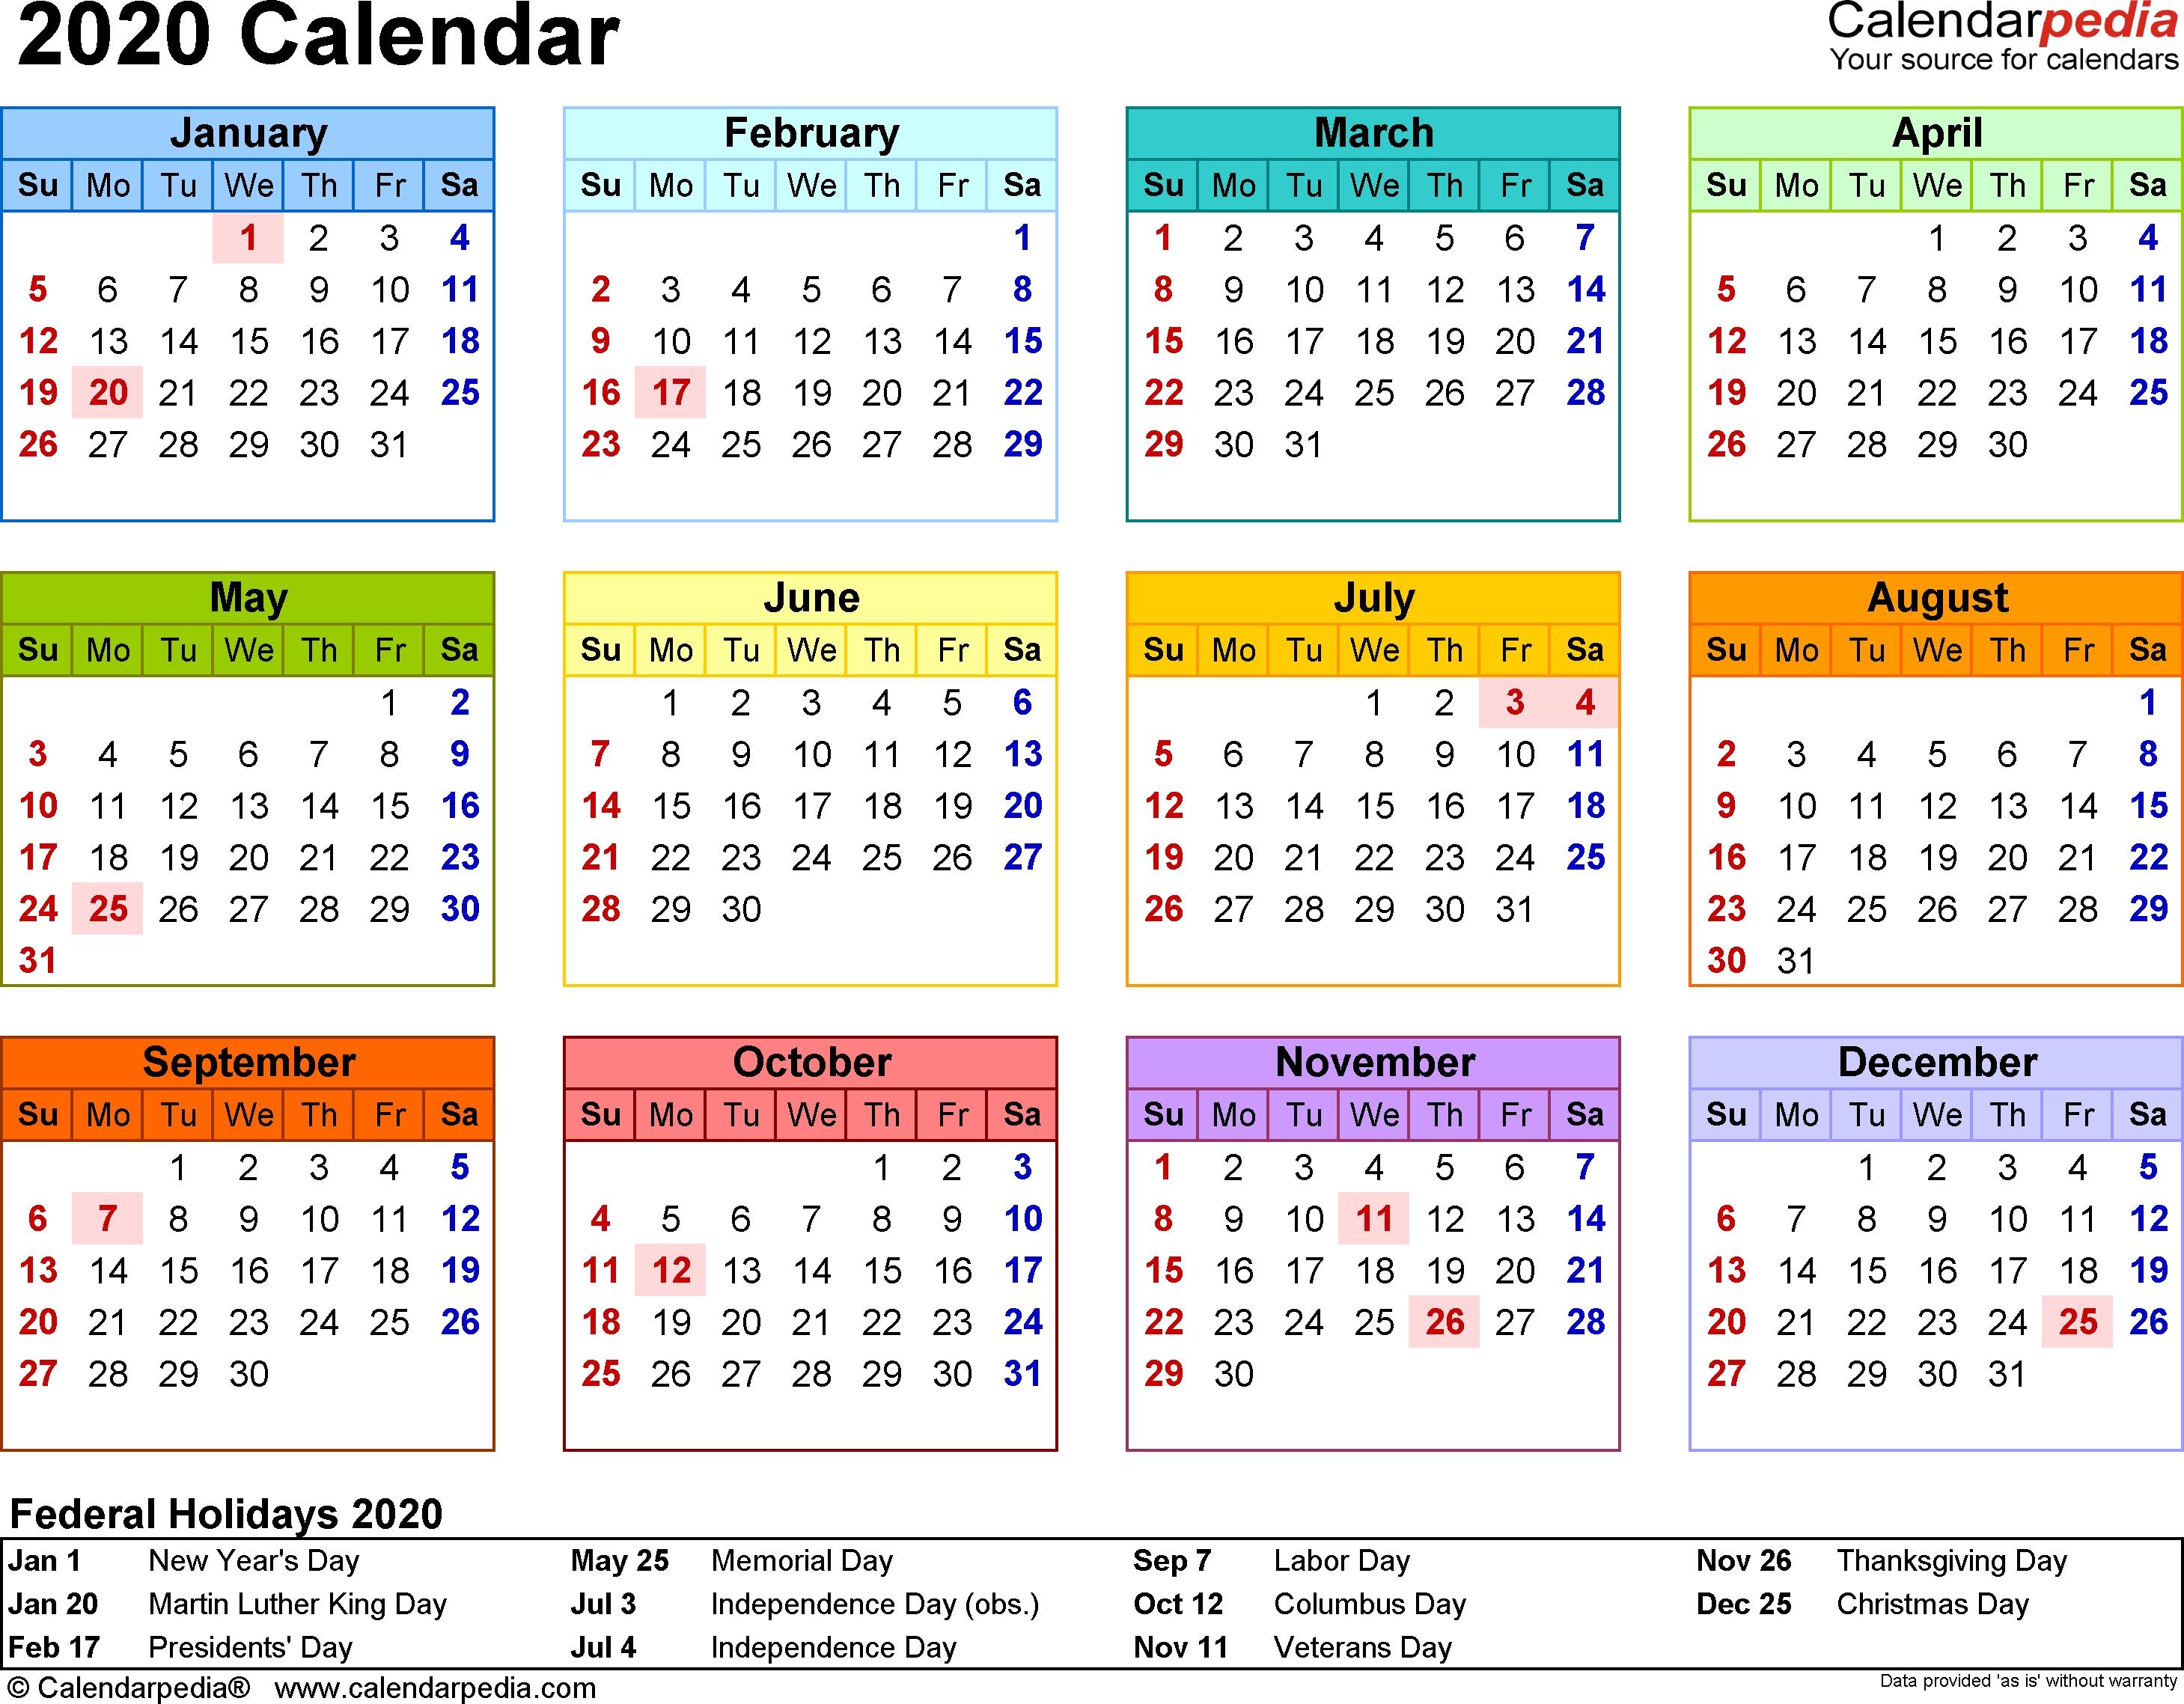 2020 Calendar - 18 Free Printable Word Calendar Templates-Free Microsoft Word Calendar Template 2020